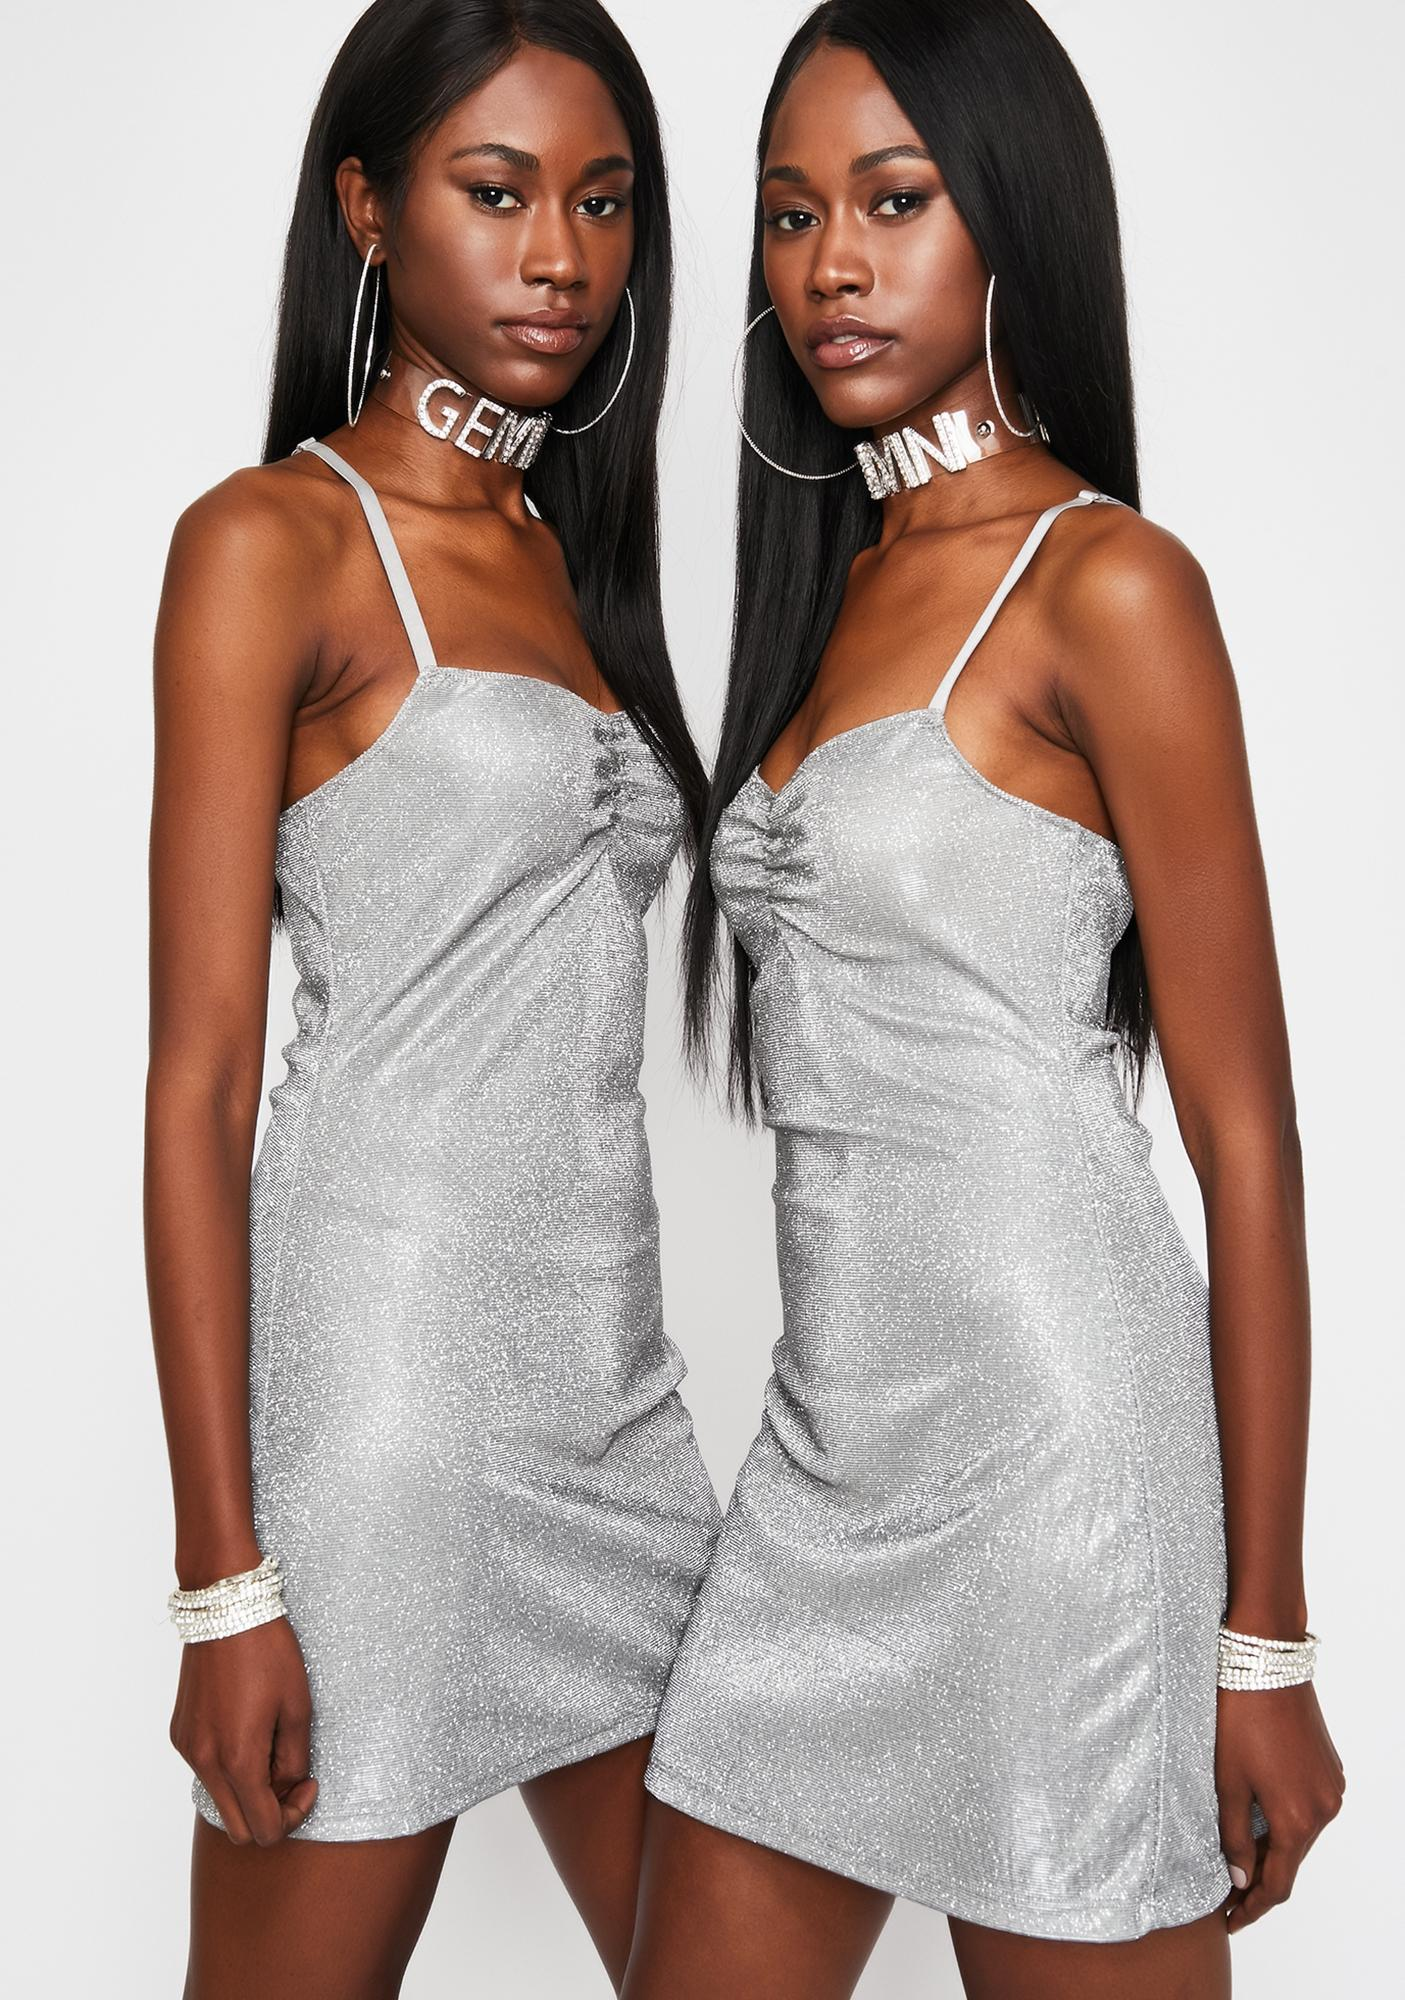 HOROSCOPEZ Mercury Sparkle Mini Dress